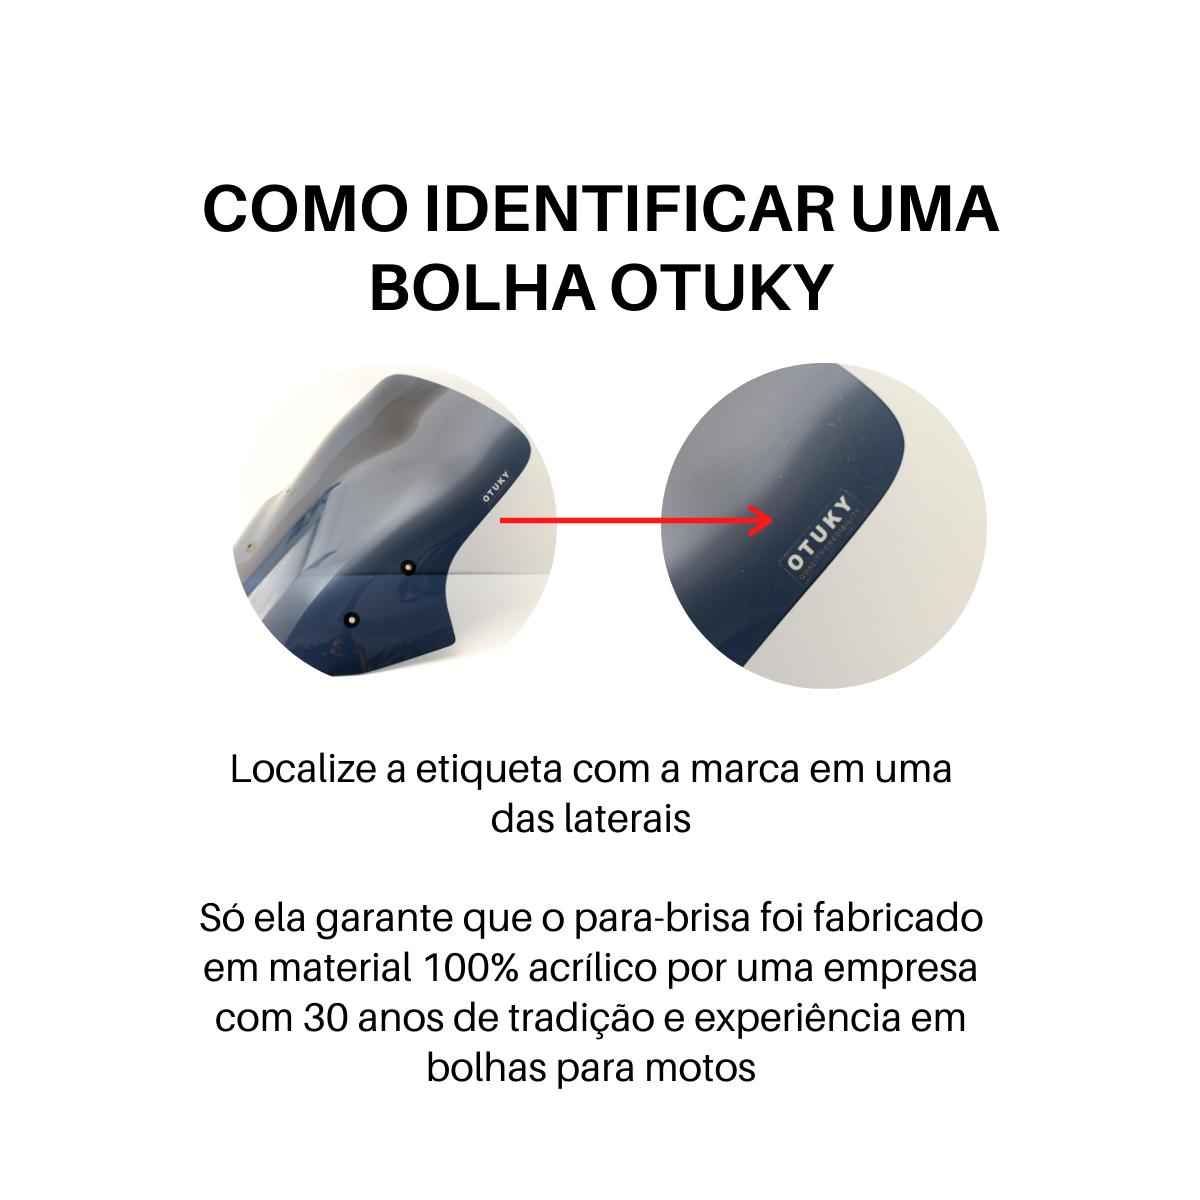 Bolha para Moto PCX 125 150 2013 Até 2018 Otuky Padrão Fumê Marrom